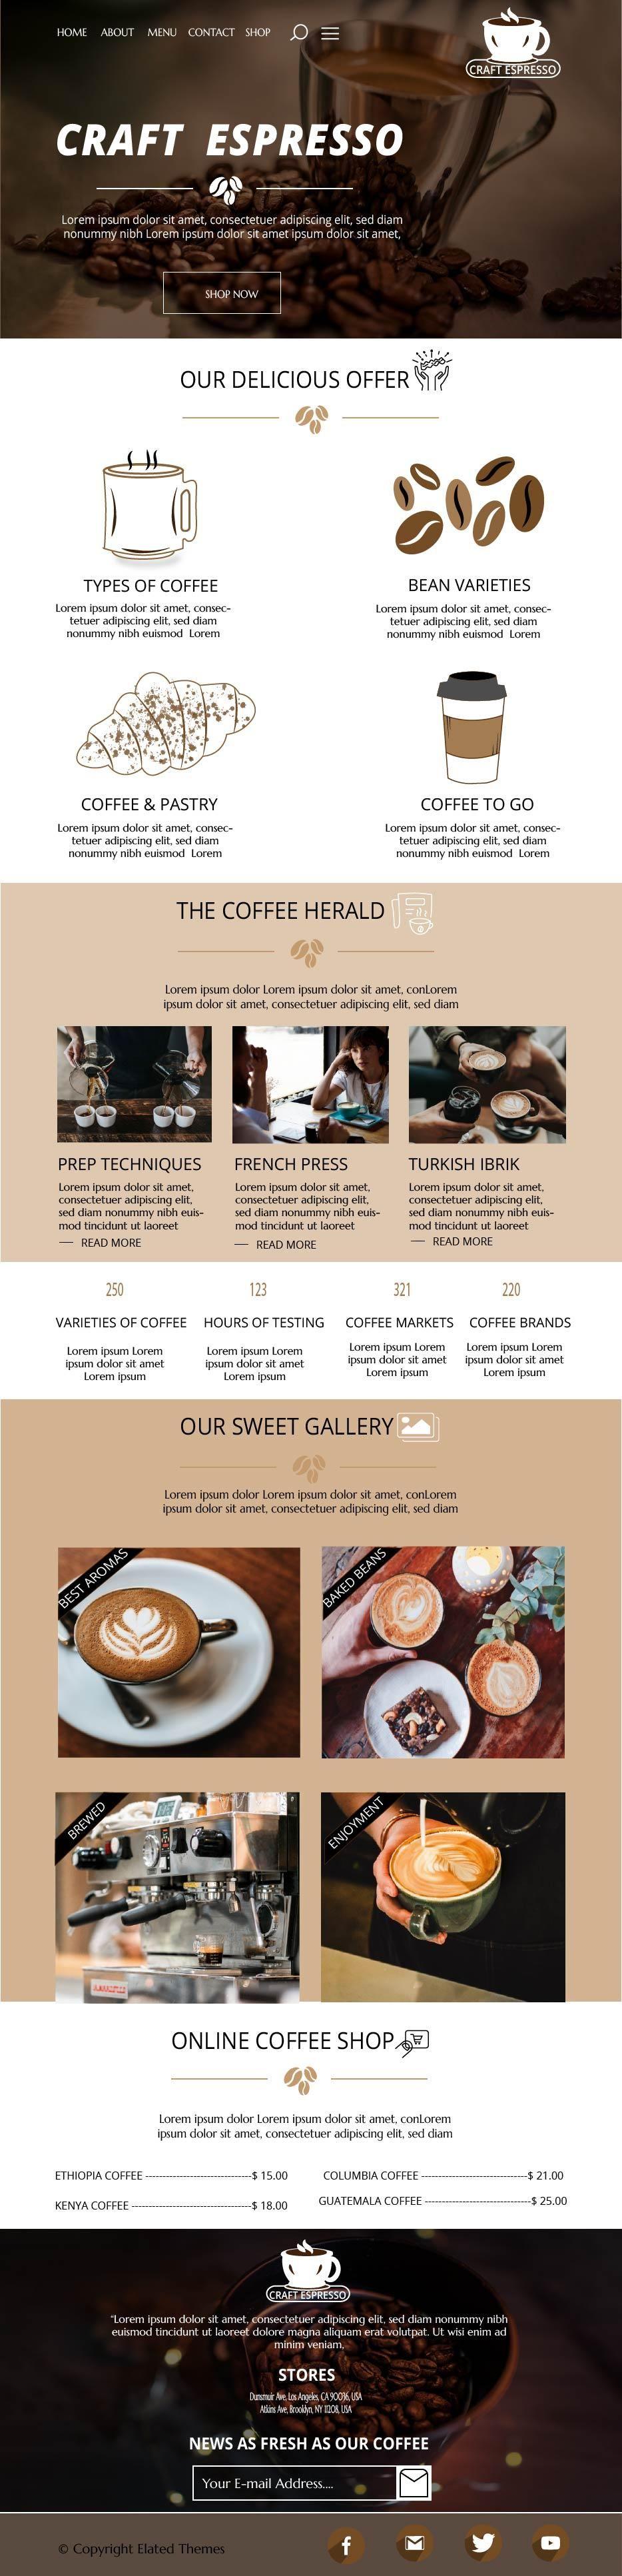 Craft Espresso Web design - image 3 - student project